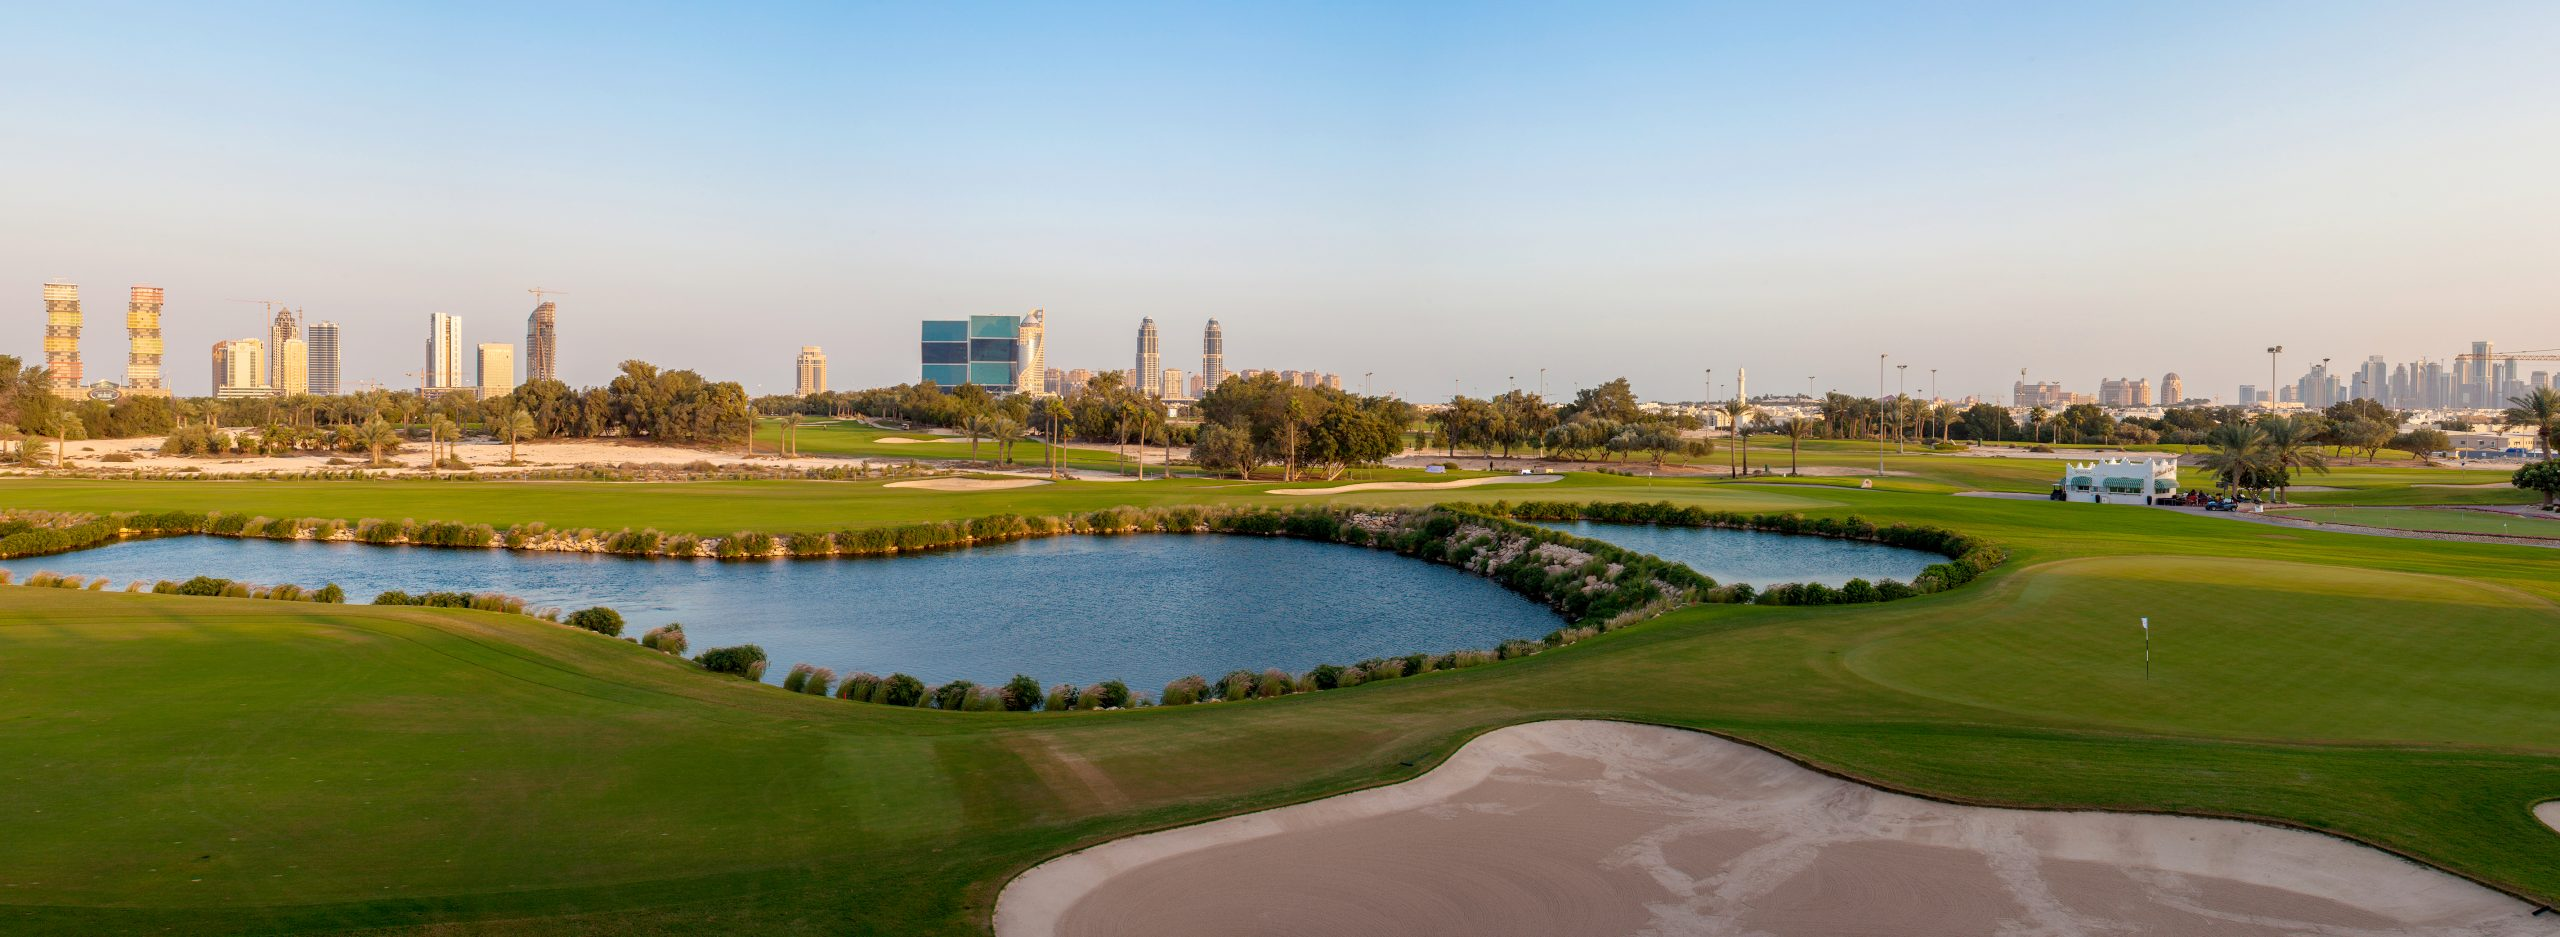 CNN: Doha Golf Club; A green oasis in the heart of Doha